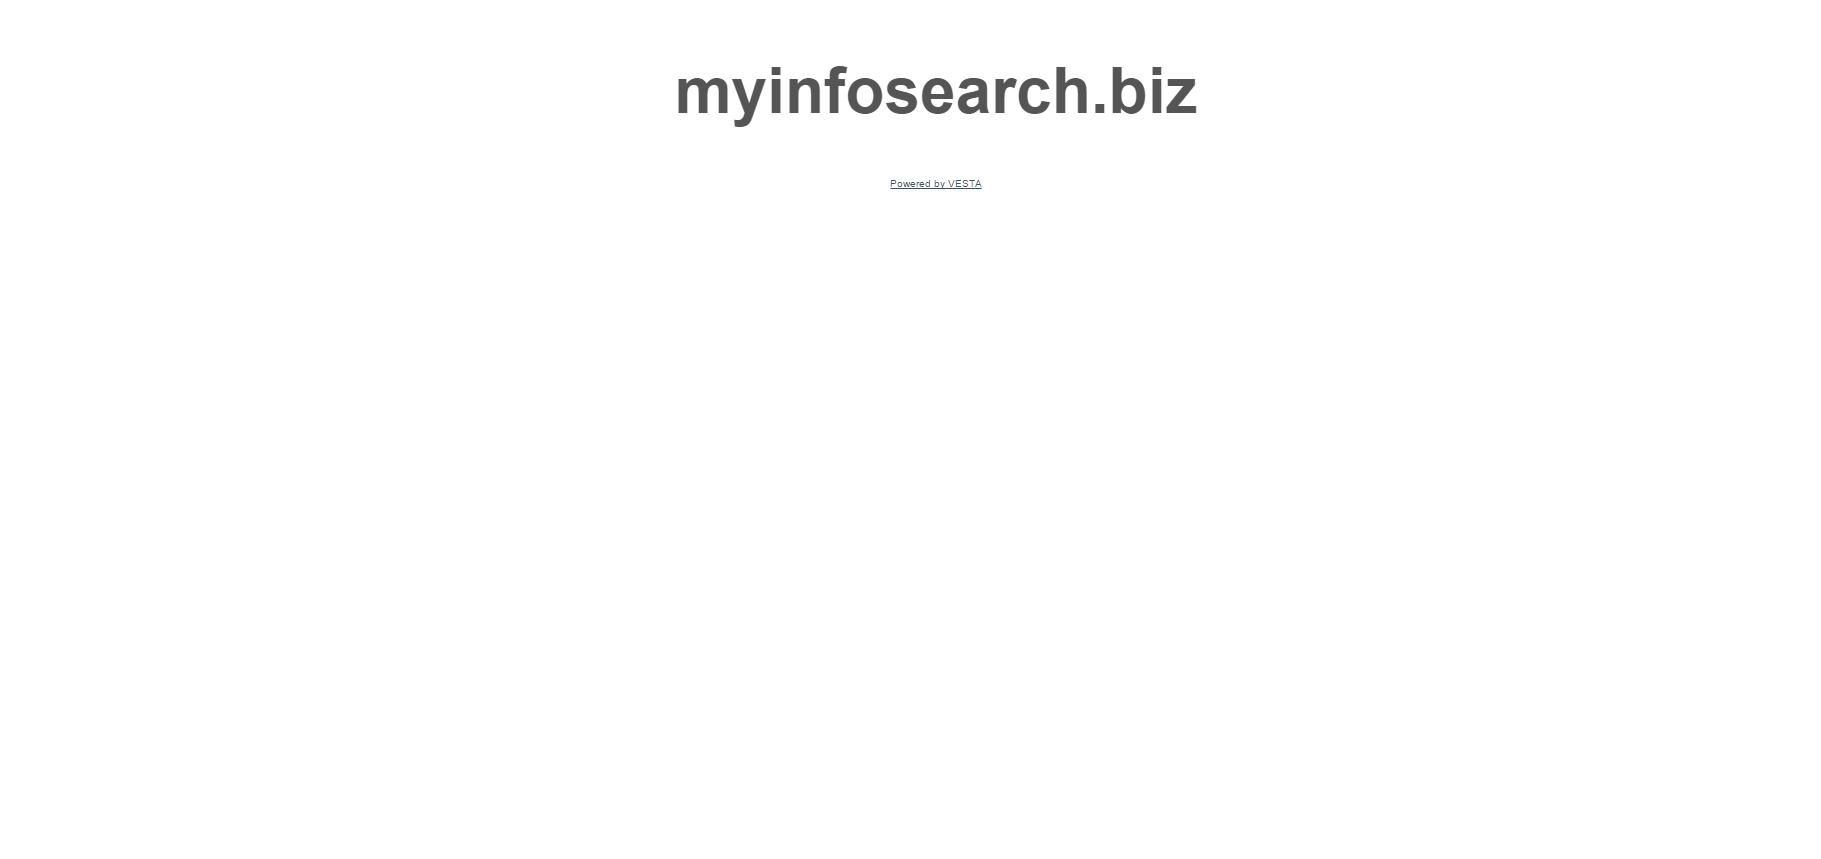 Myinfosearch.biz Ads